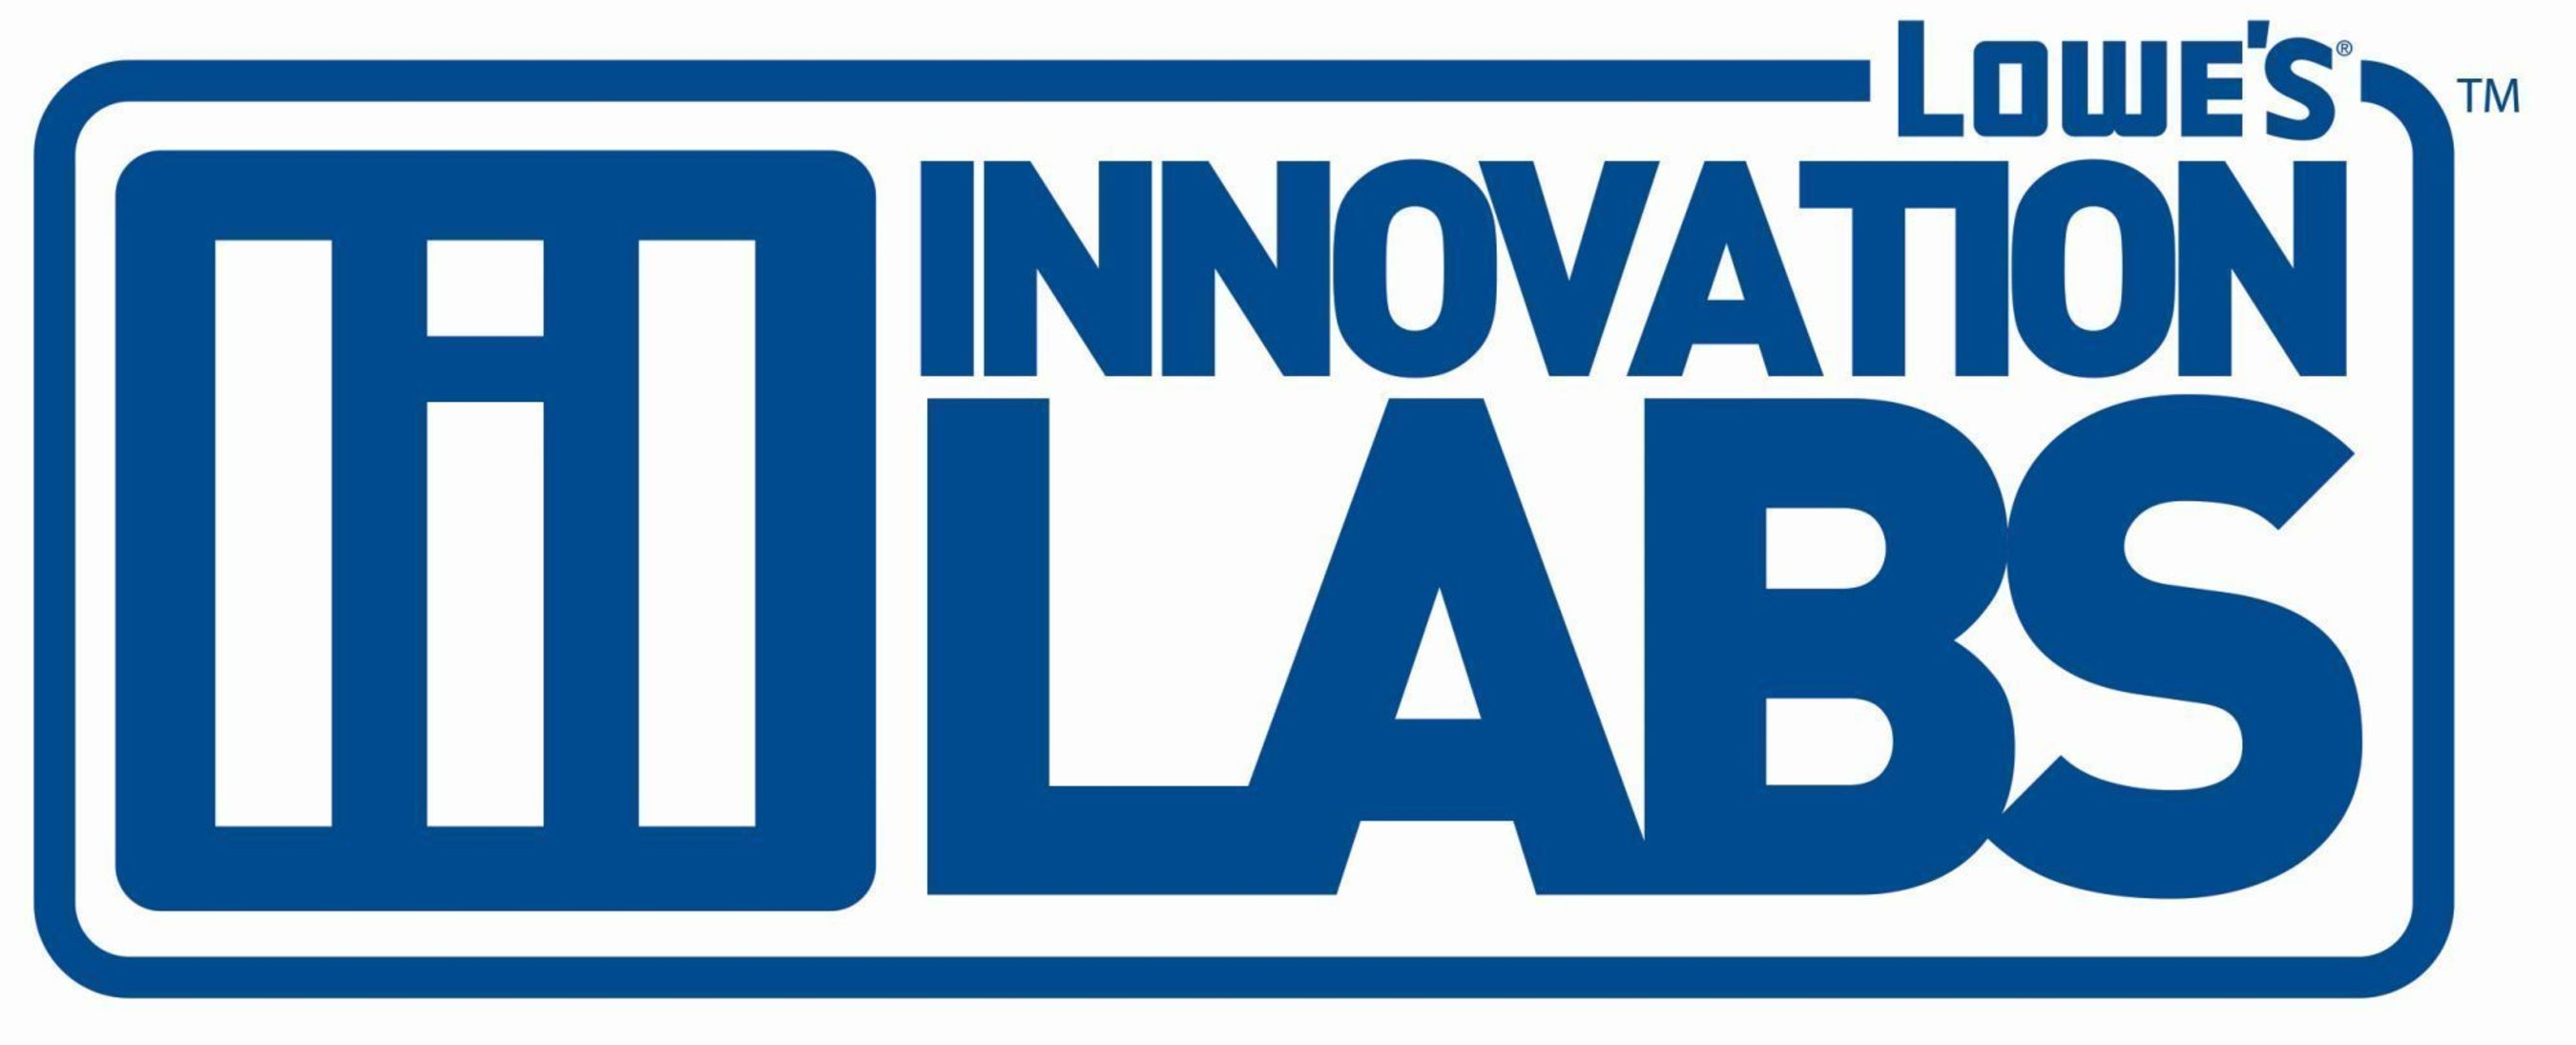 Lowe's Innovation Labs (PRNewsFoto/Lowe's Companies, Inc.)